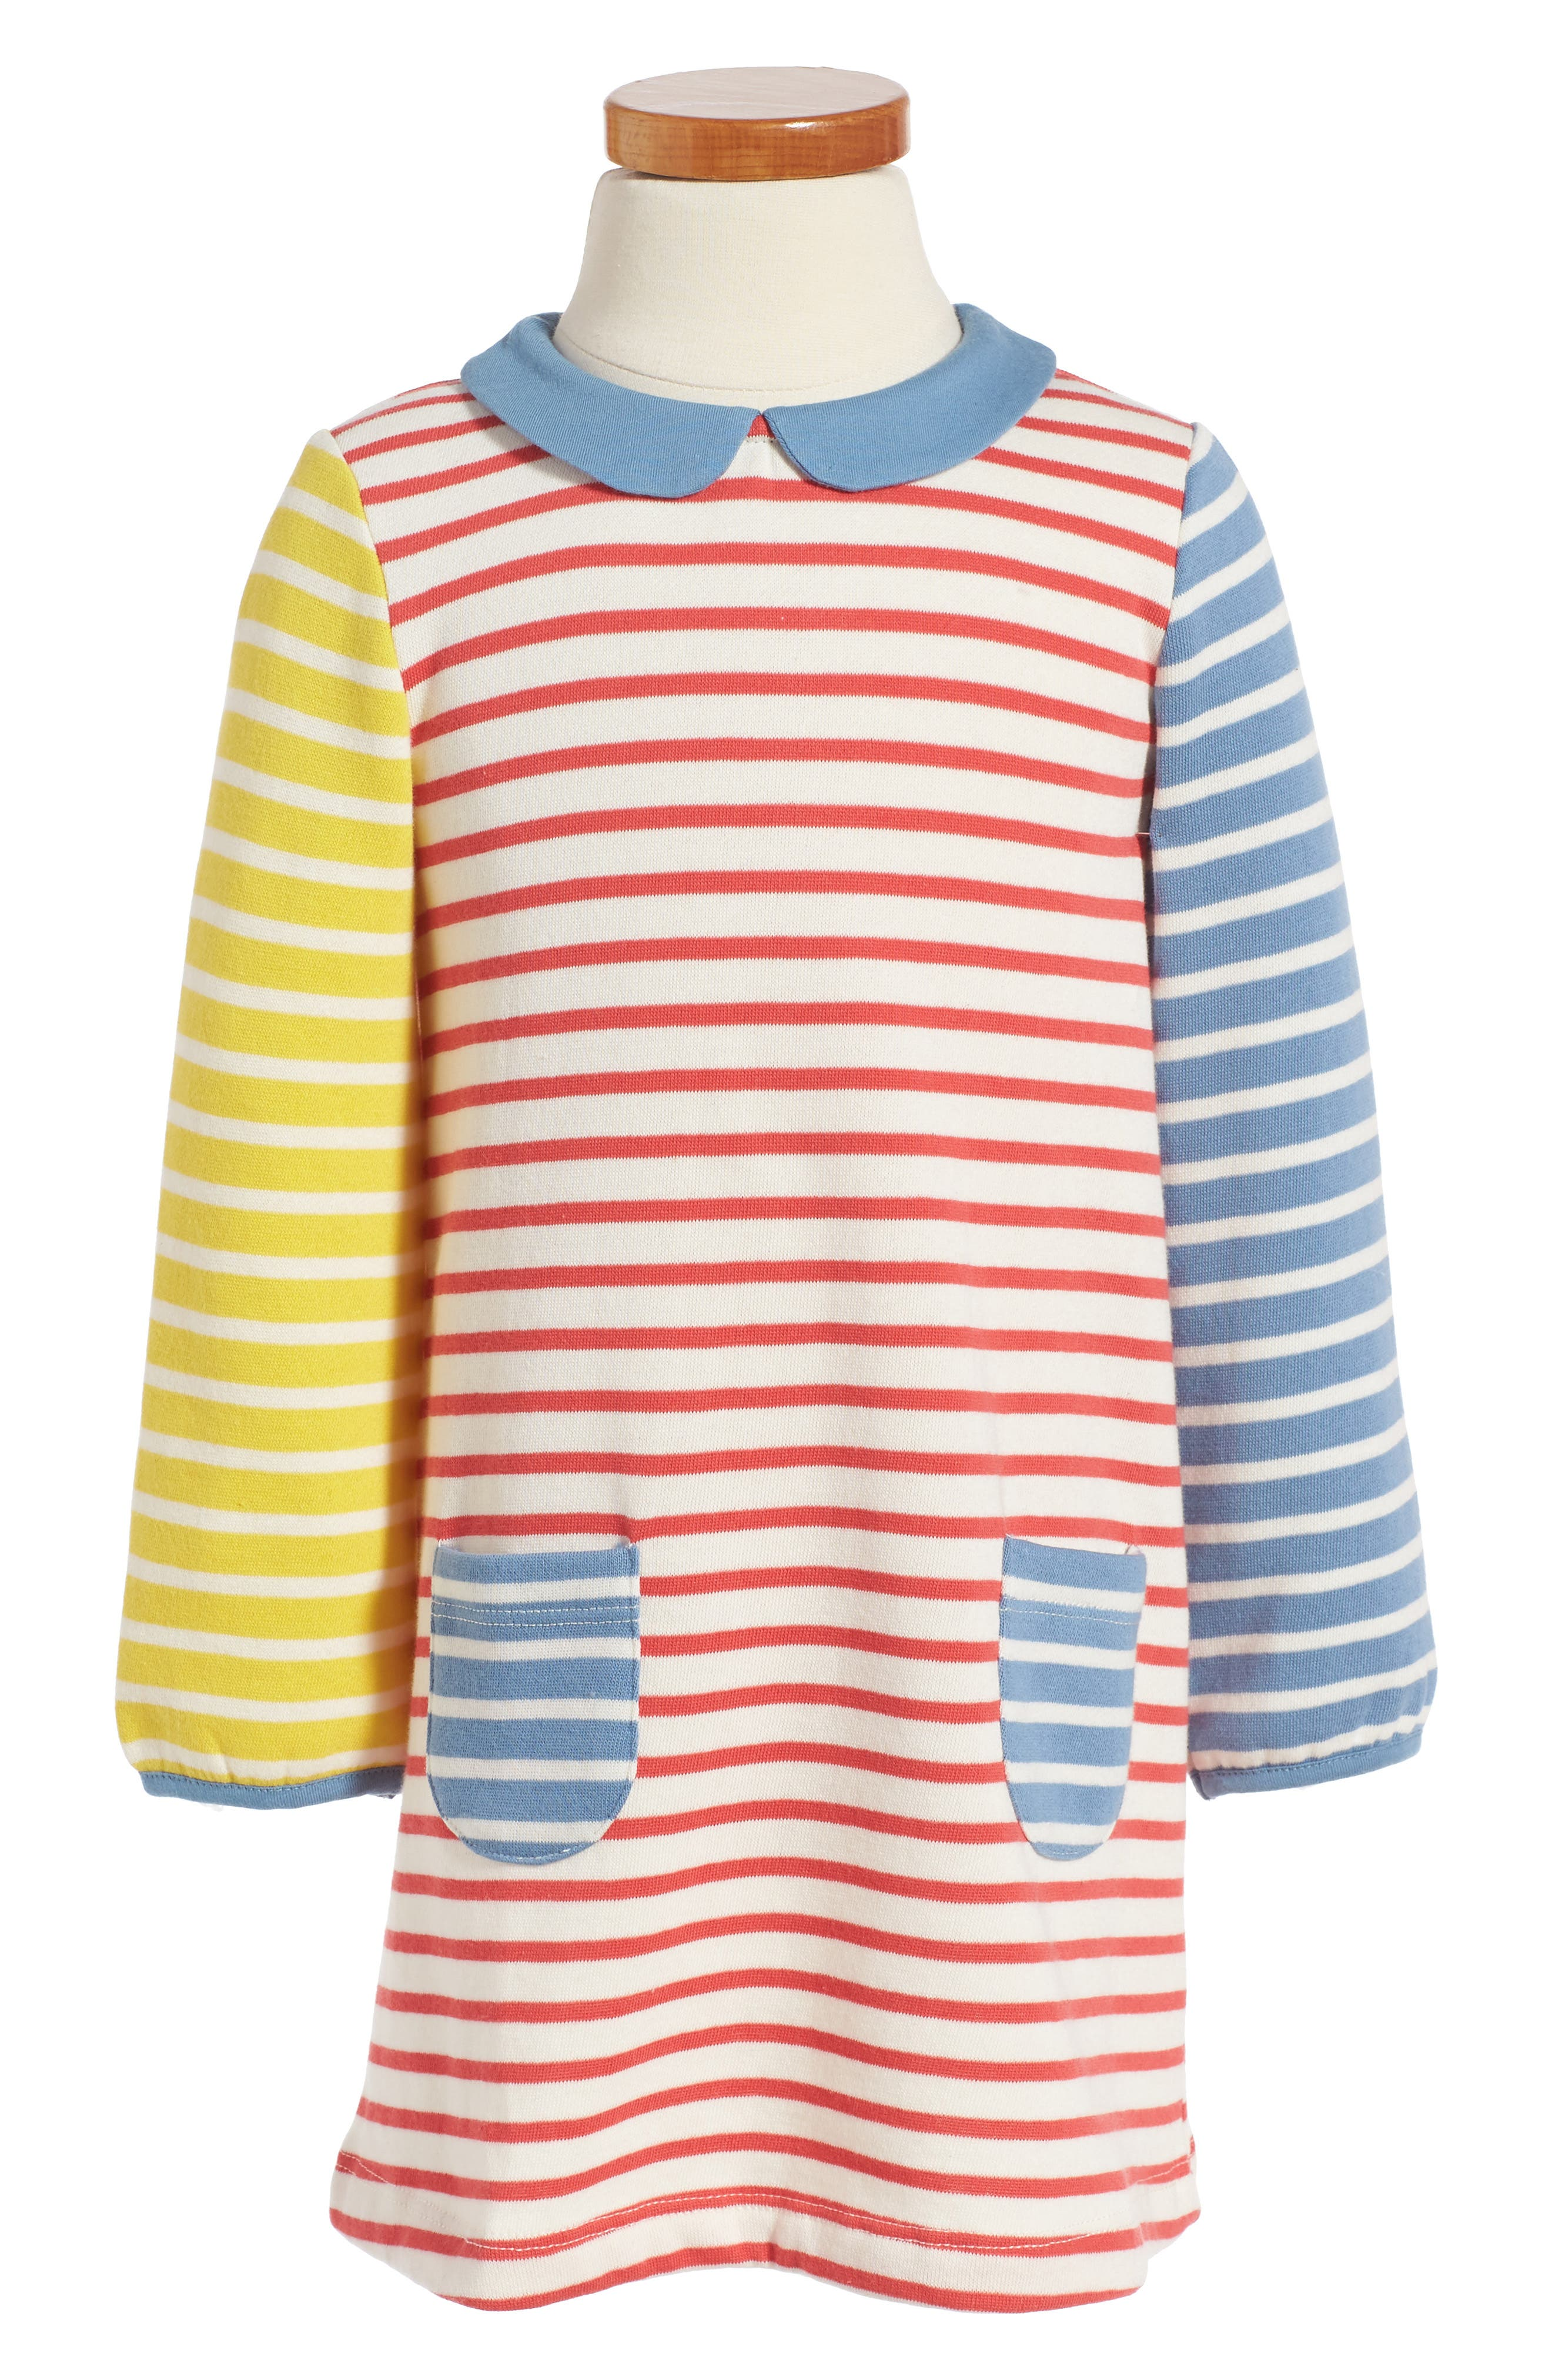 Alternate Image 1 Selected - Mini Boden Cosy Peter Pan Collar Sweatshirt Dress (Baby Girls & Toddler Girls)